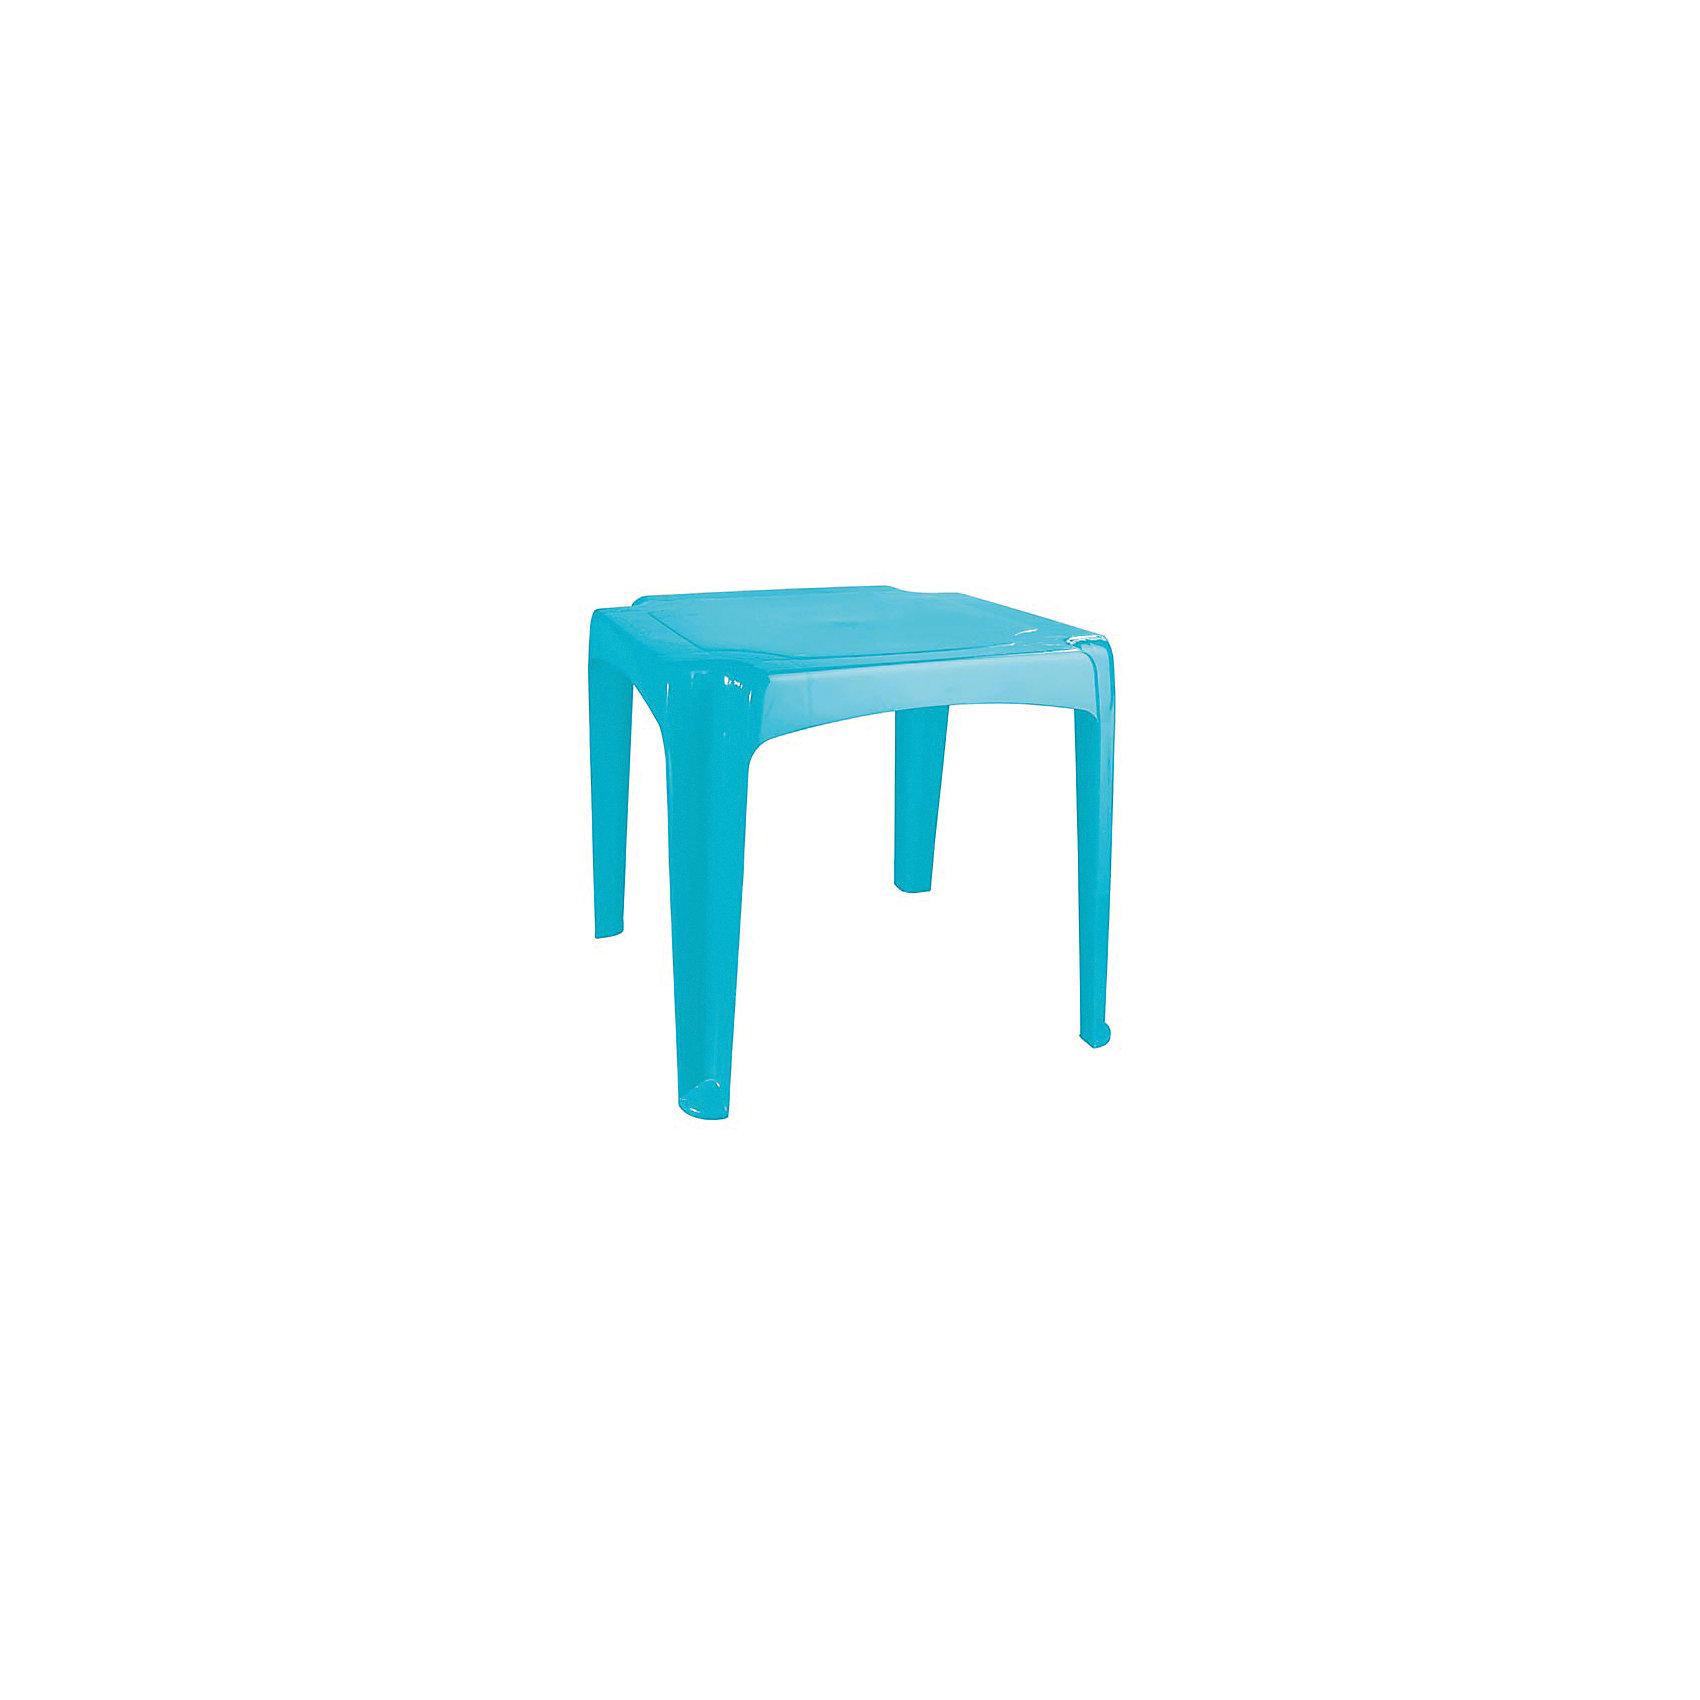 Стол 520х520х475 мм, Пластишка, голубой